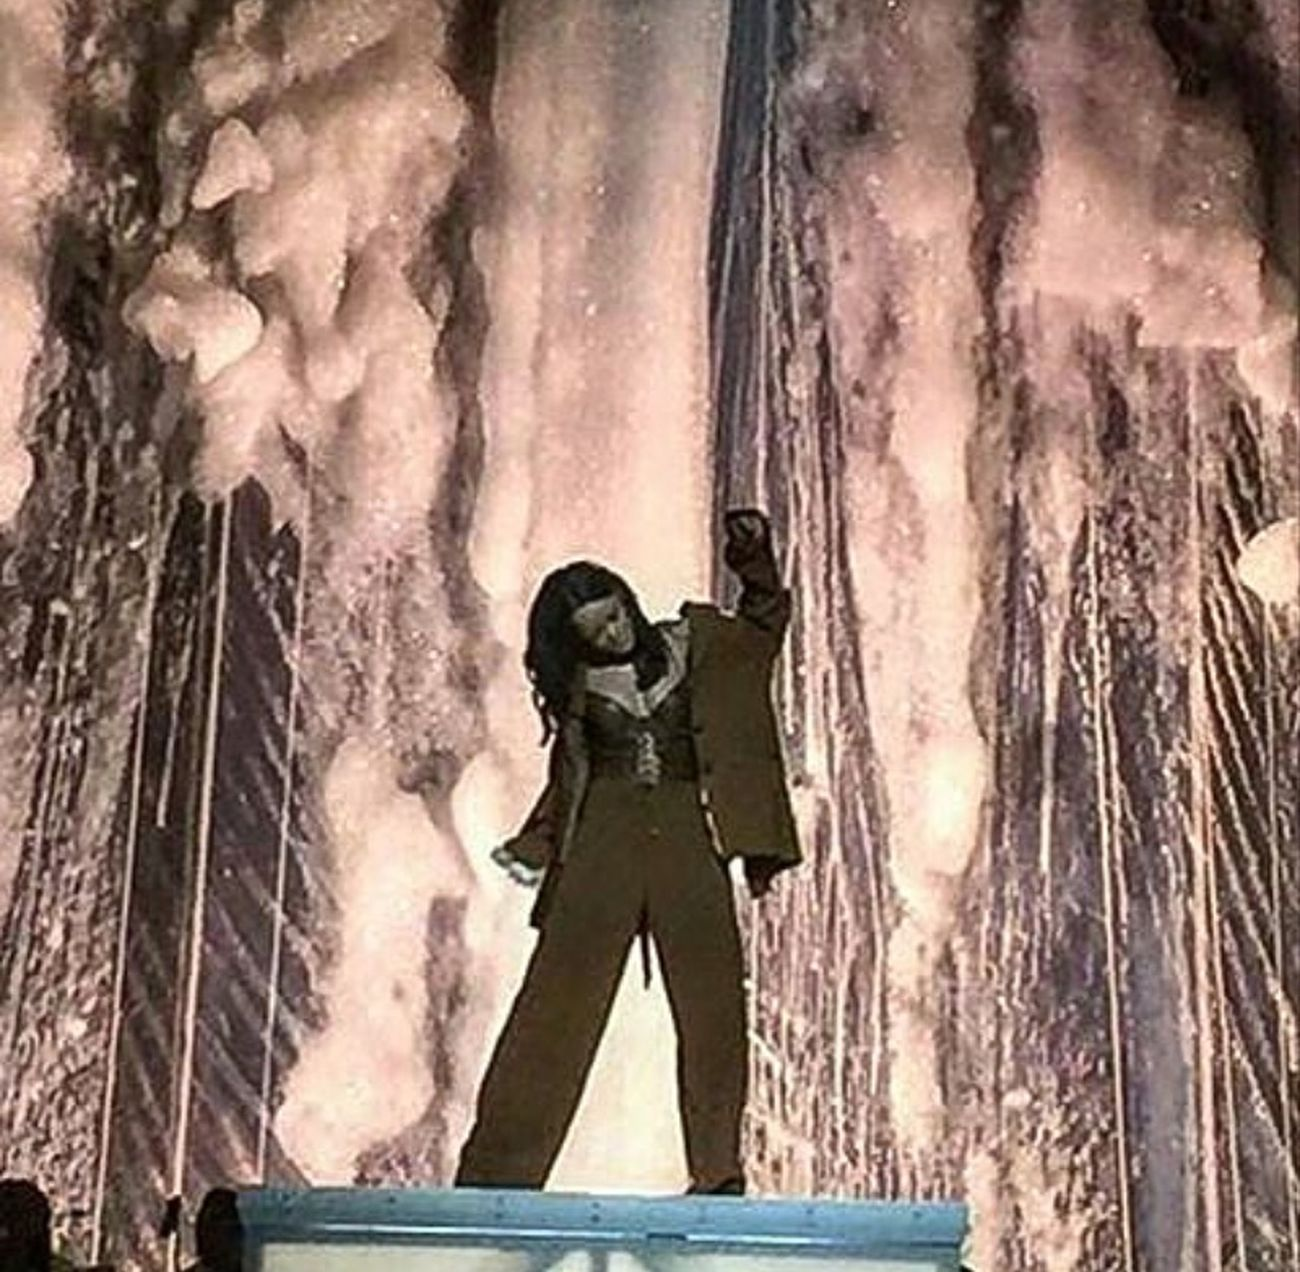 Rihanna Awt Antiworldtour Anti Badgalriri Badgal Badgirl 🍁 AmazingConcert